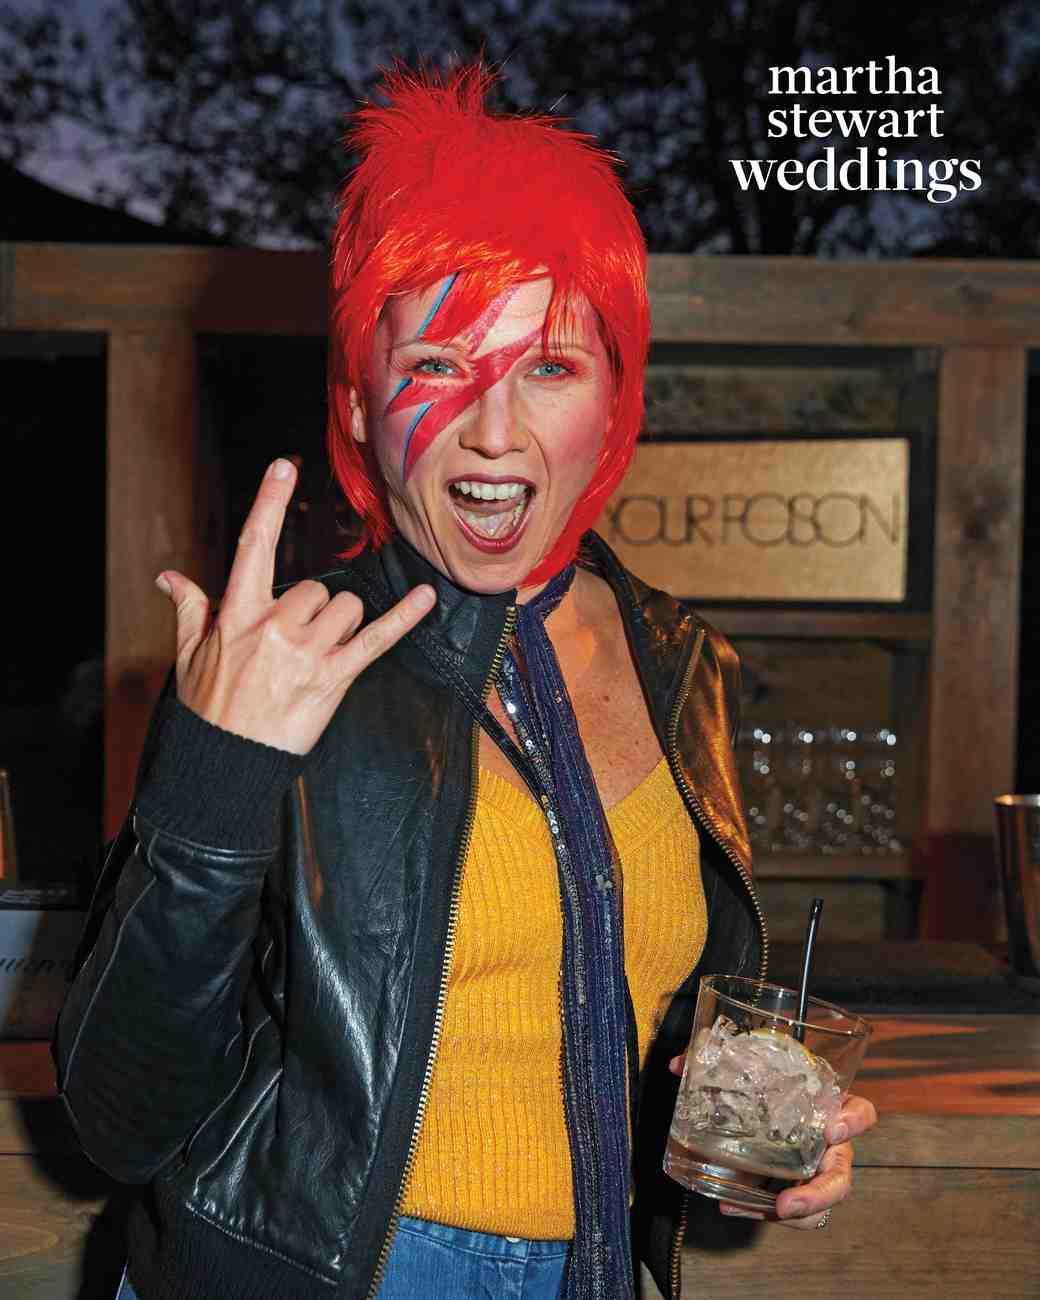 jamie-bryan-wedding-11-costume-party-bowie-0606-d112664.jpg